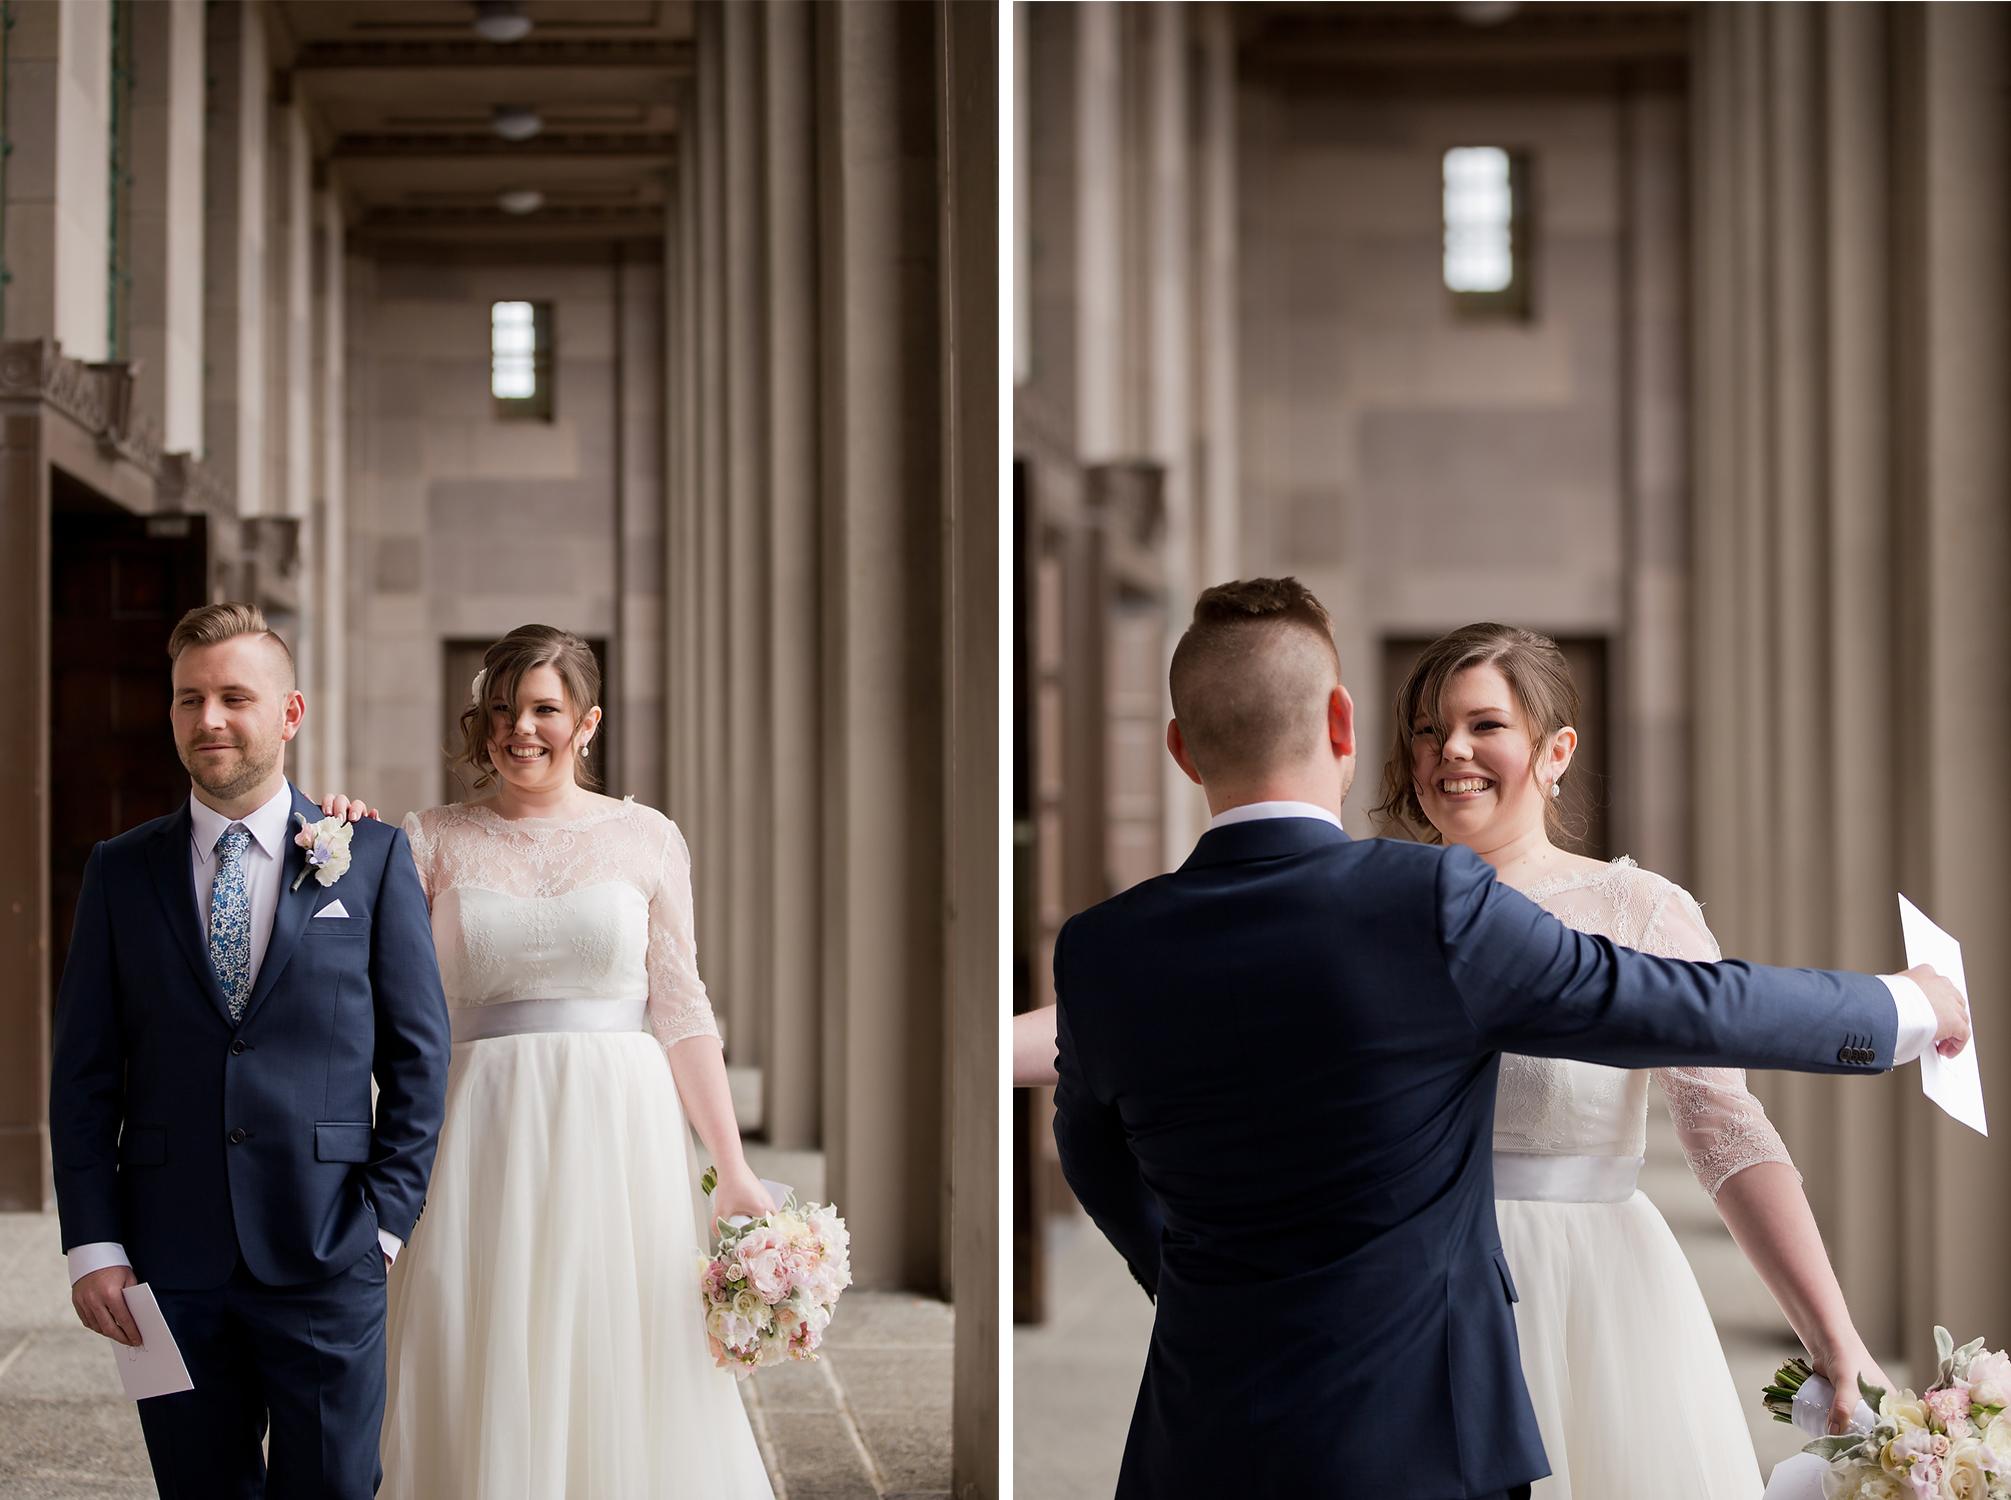 wellington wedding photography NZ - 0321.JPG